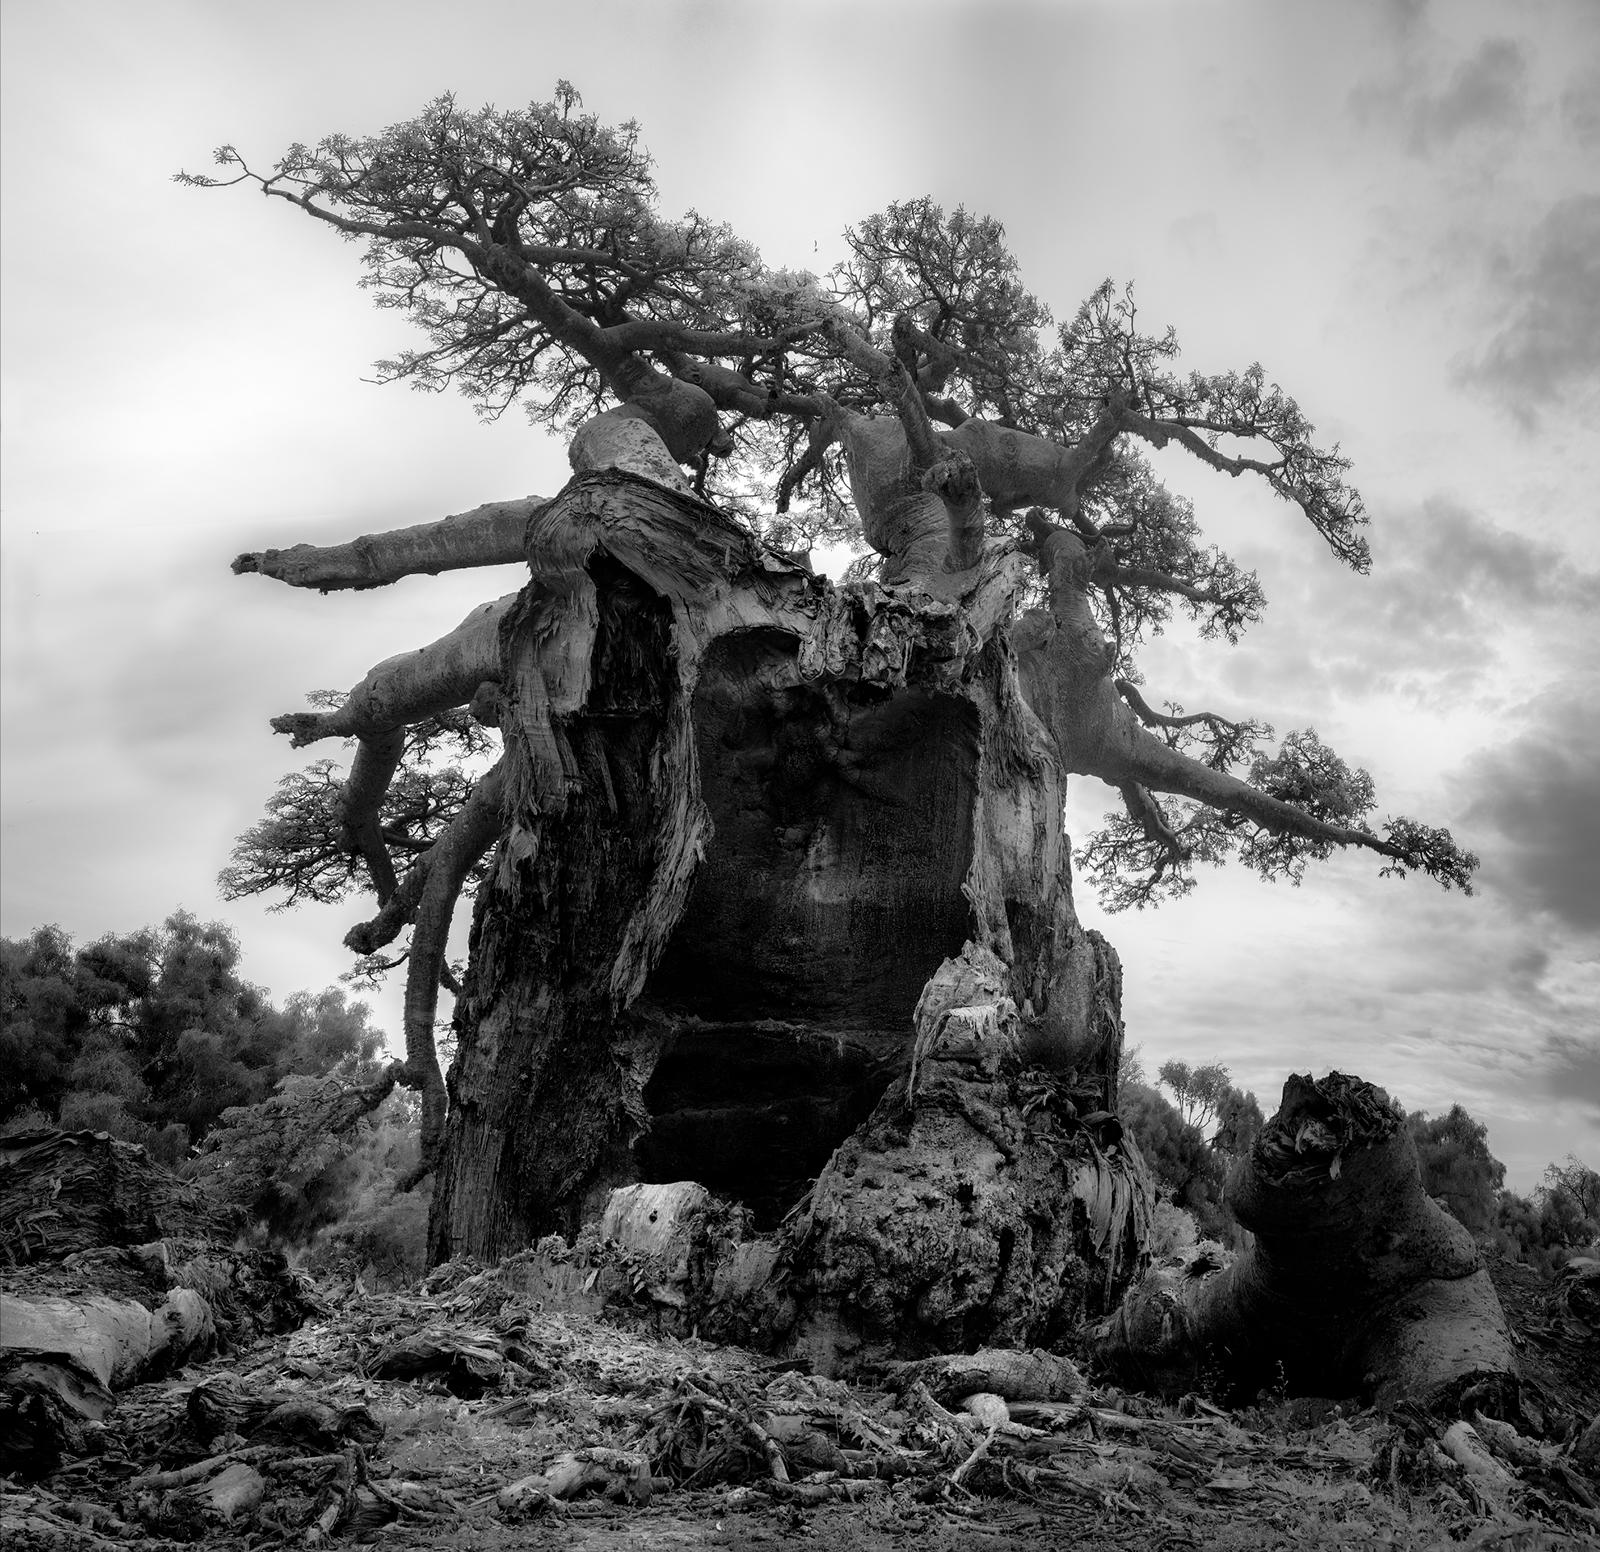 Tsitakakoike, Day; photograph by Beth Moon from her book Baobab